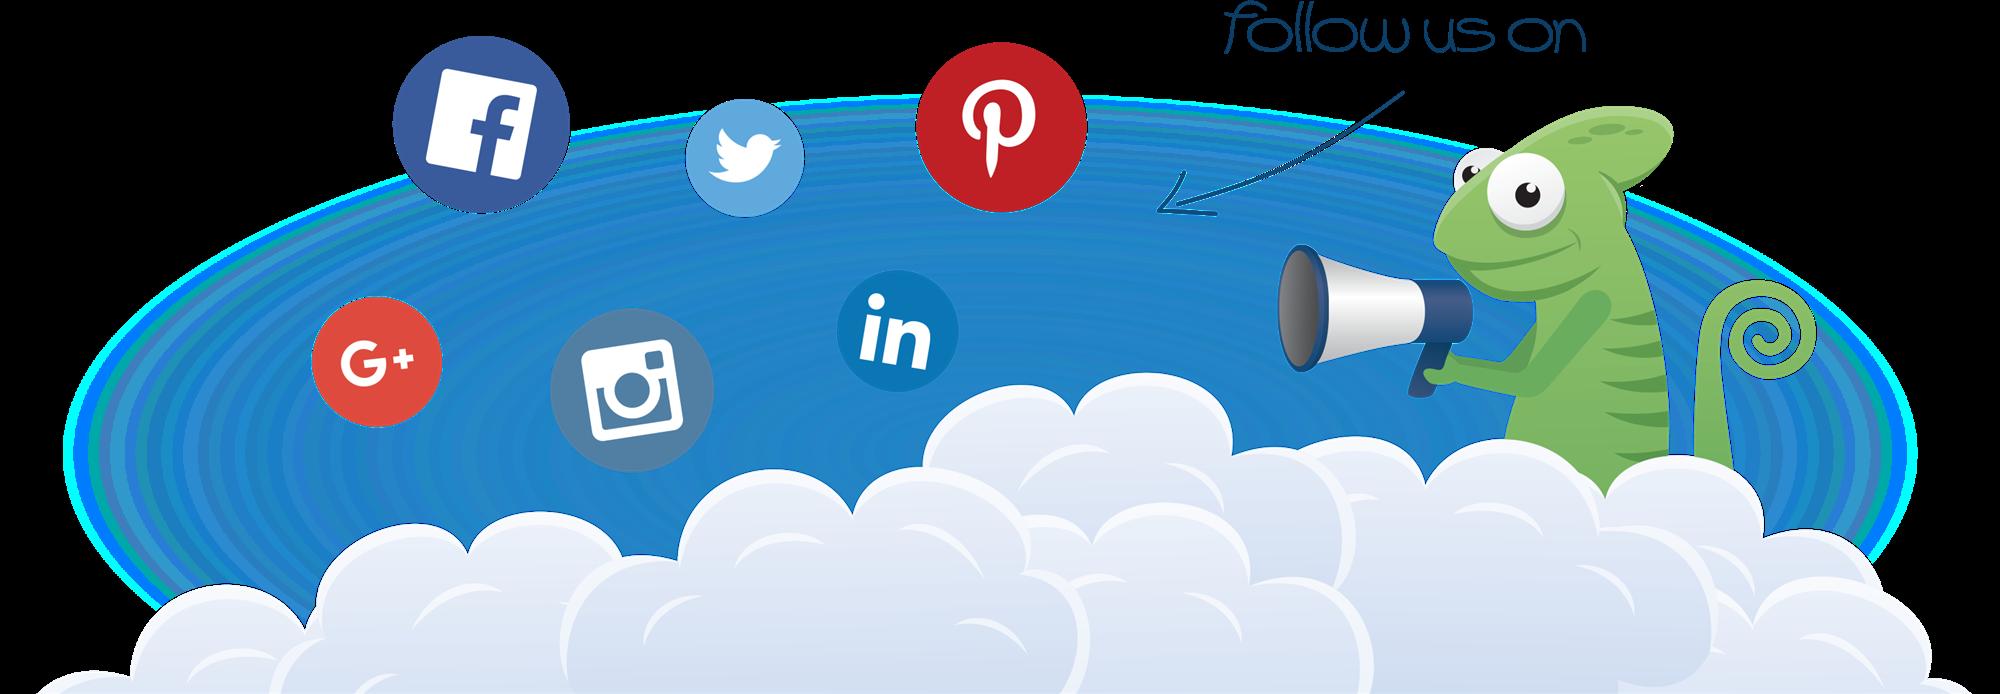 Propierge Social Networks